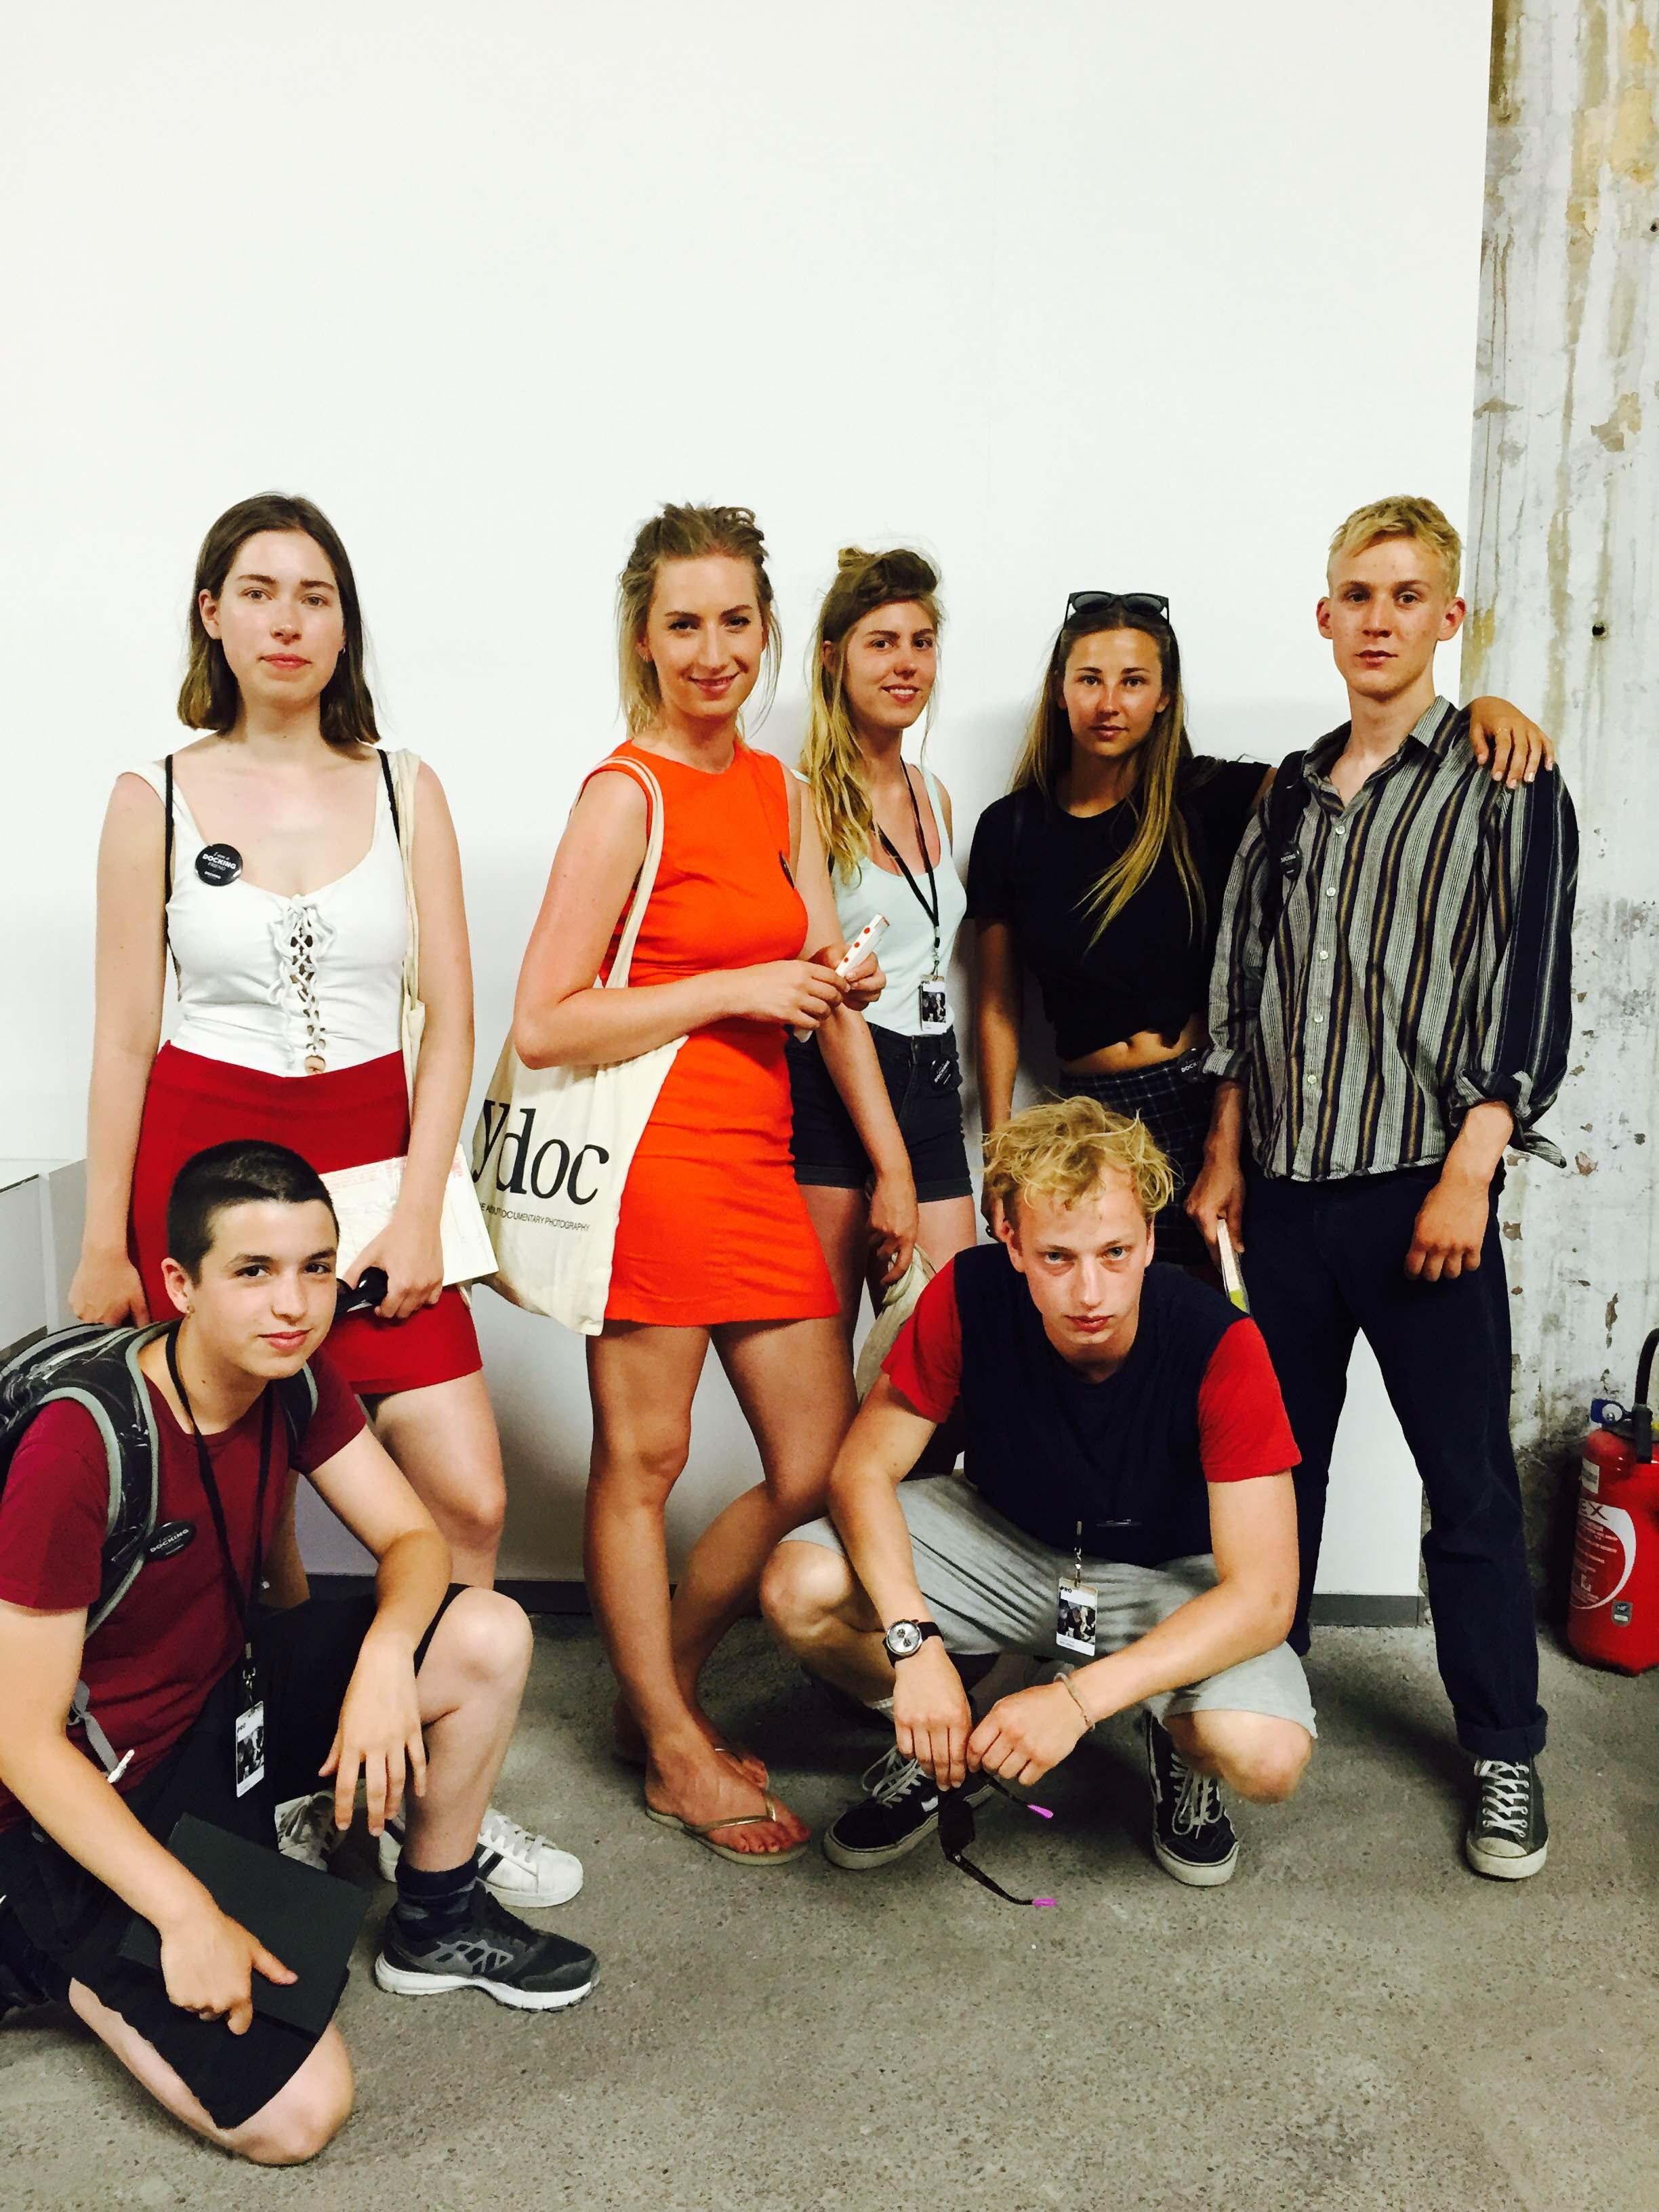 KABK STUDENTS    Stella Loning, Jonathan Hielkema, Nathan Doorduin, Sophie Daalman, David Kerssens, Linnéa Gerrits, Jill Verweijen